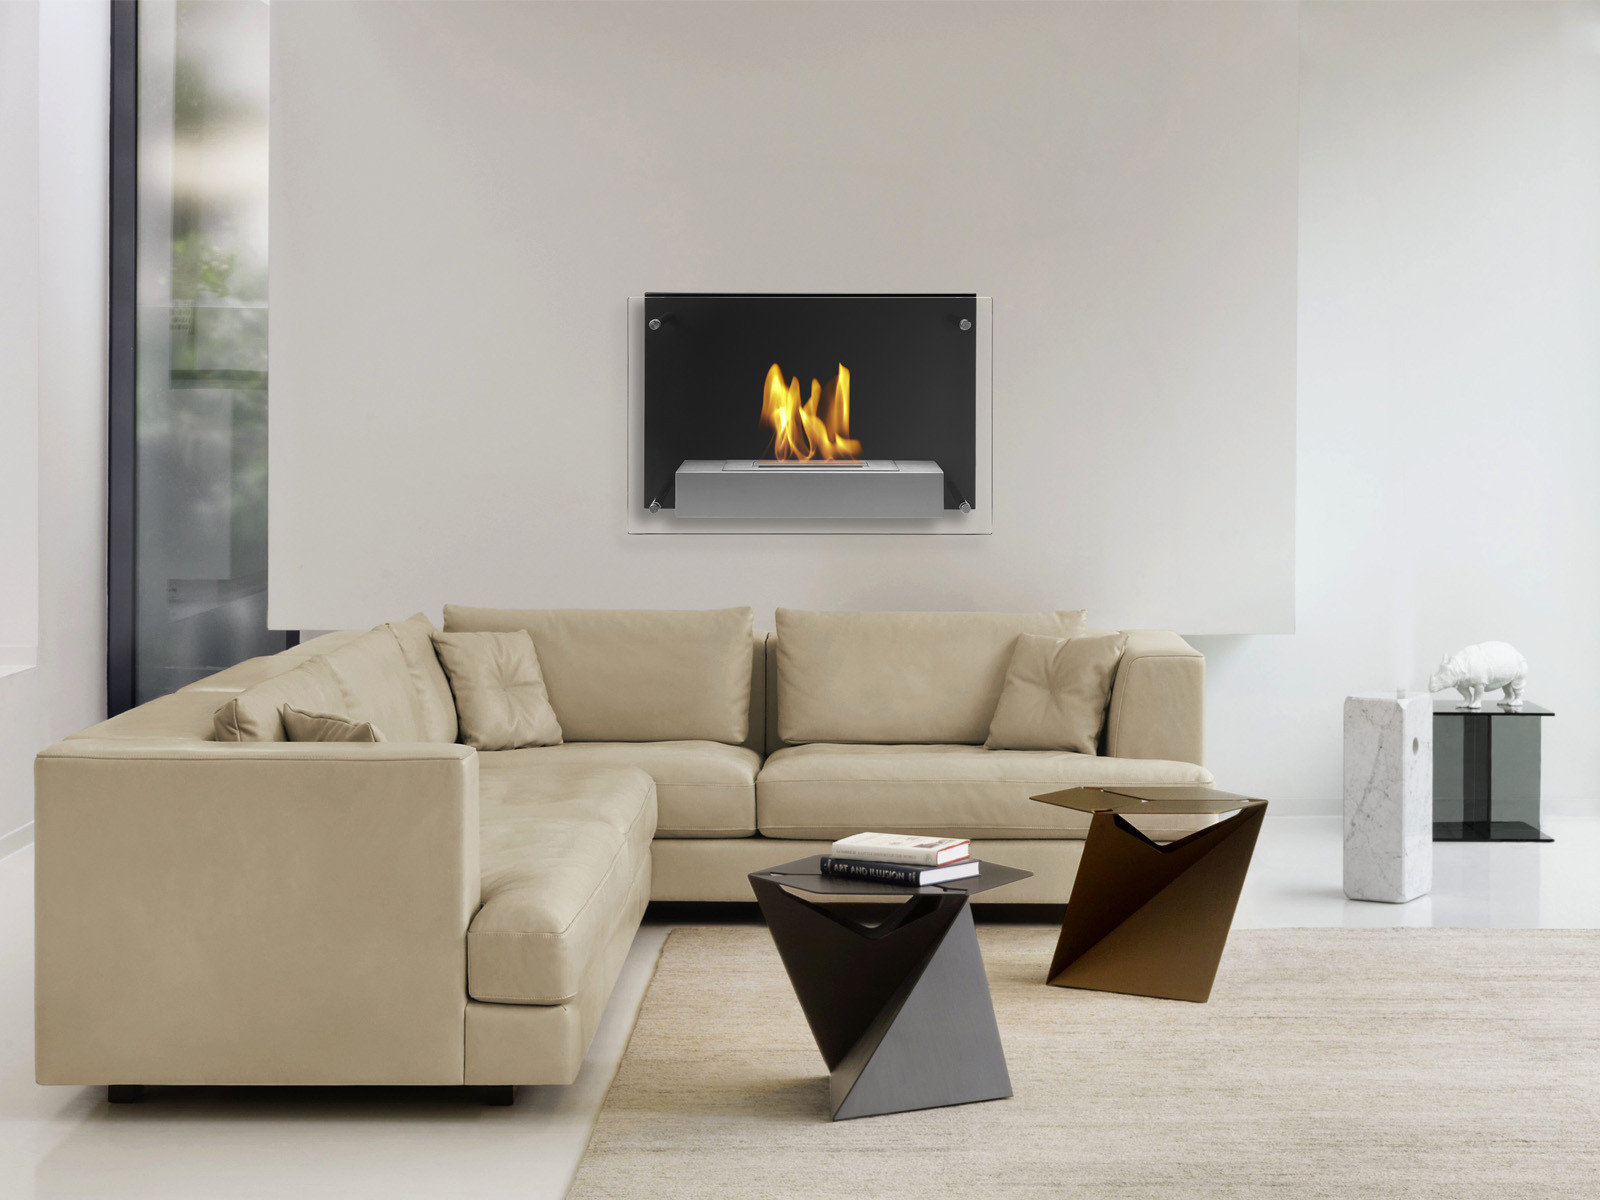 Ignis Products Senti Wall Mount Ethanol Fireplace Walmartcom